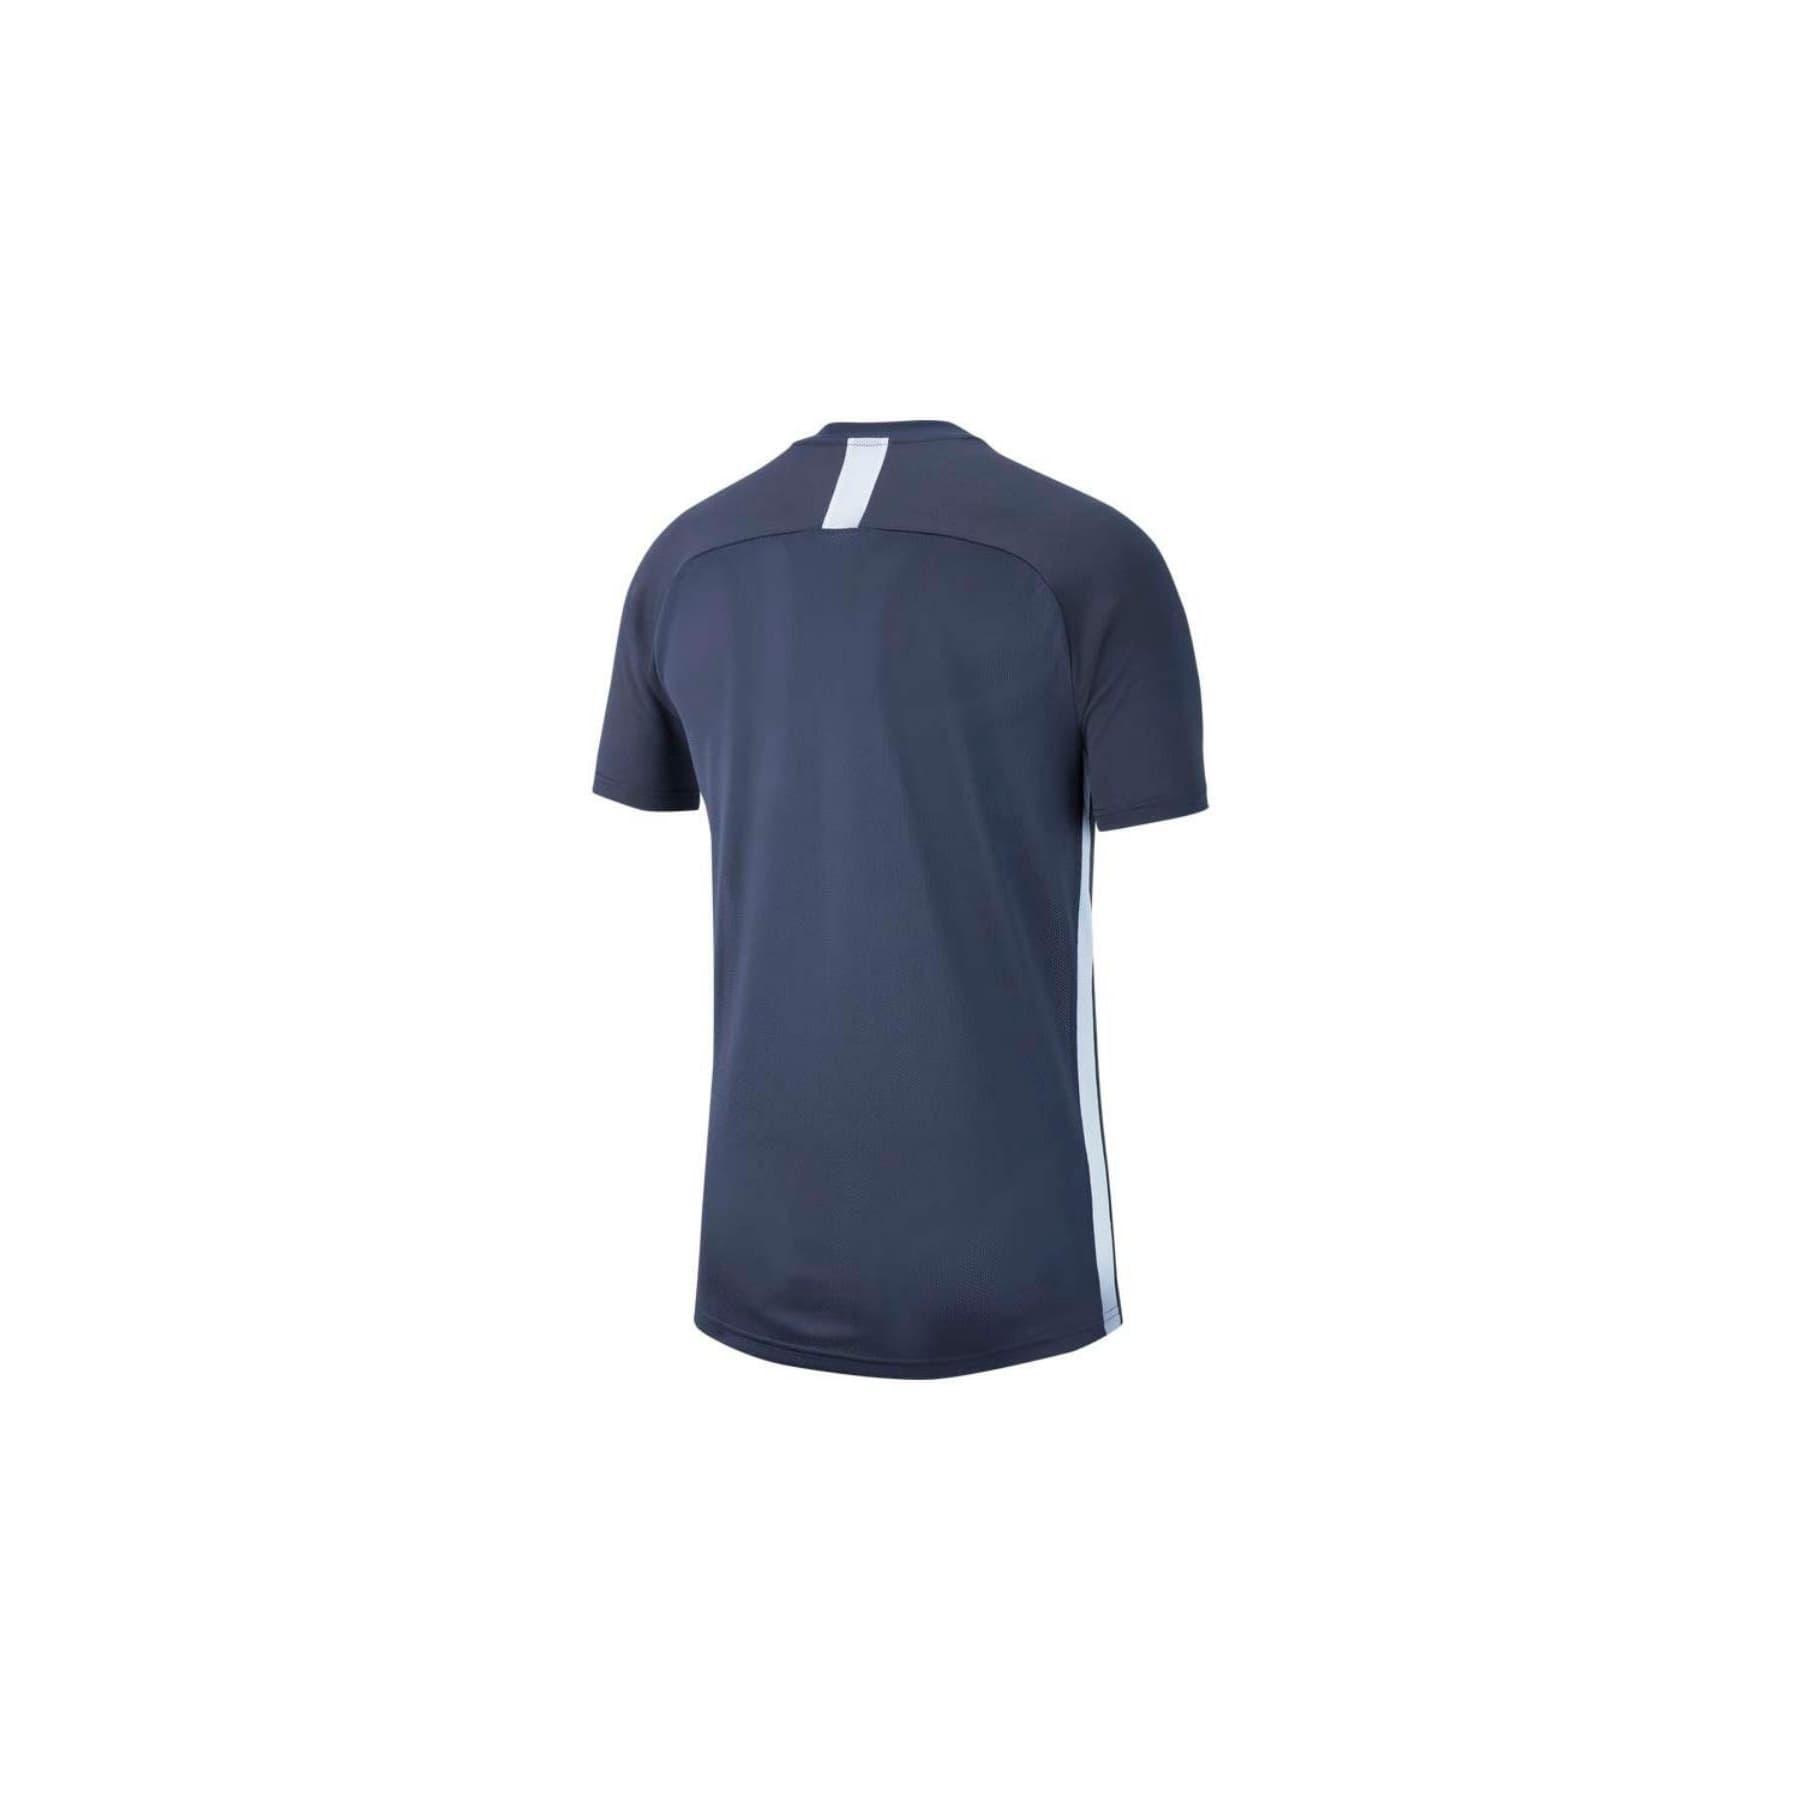 Dry Academy 19 Erkek Antrasit Polo Tişört (AJ9088-060)